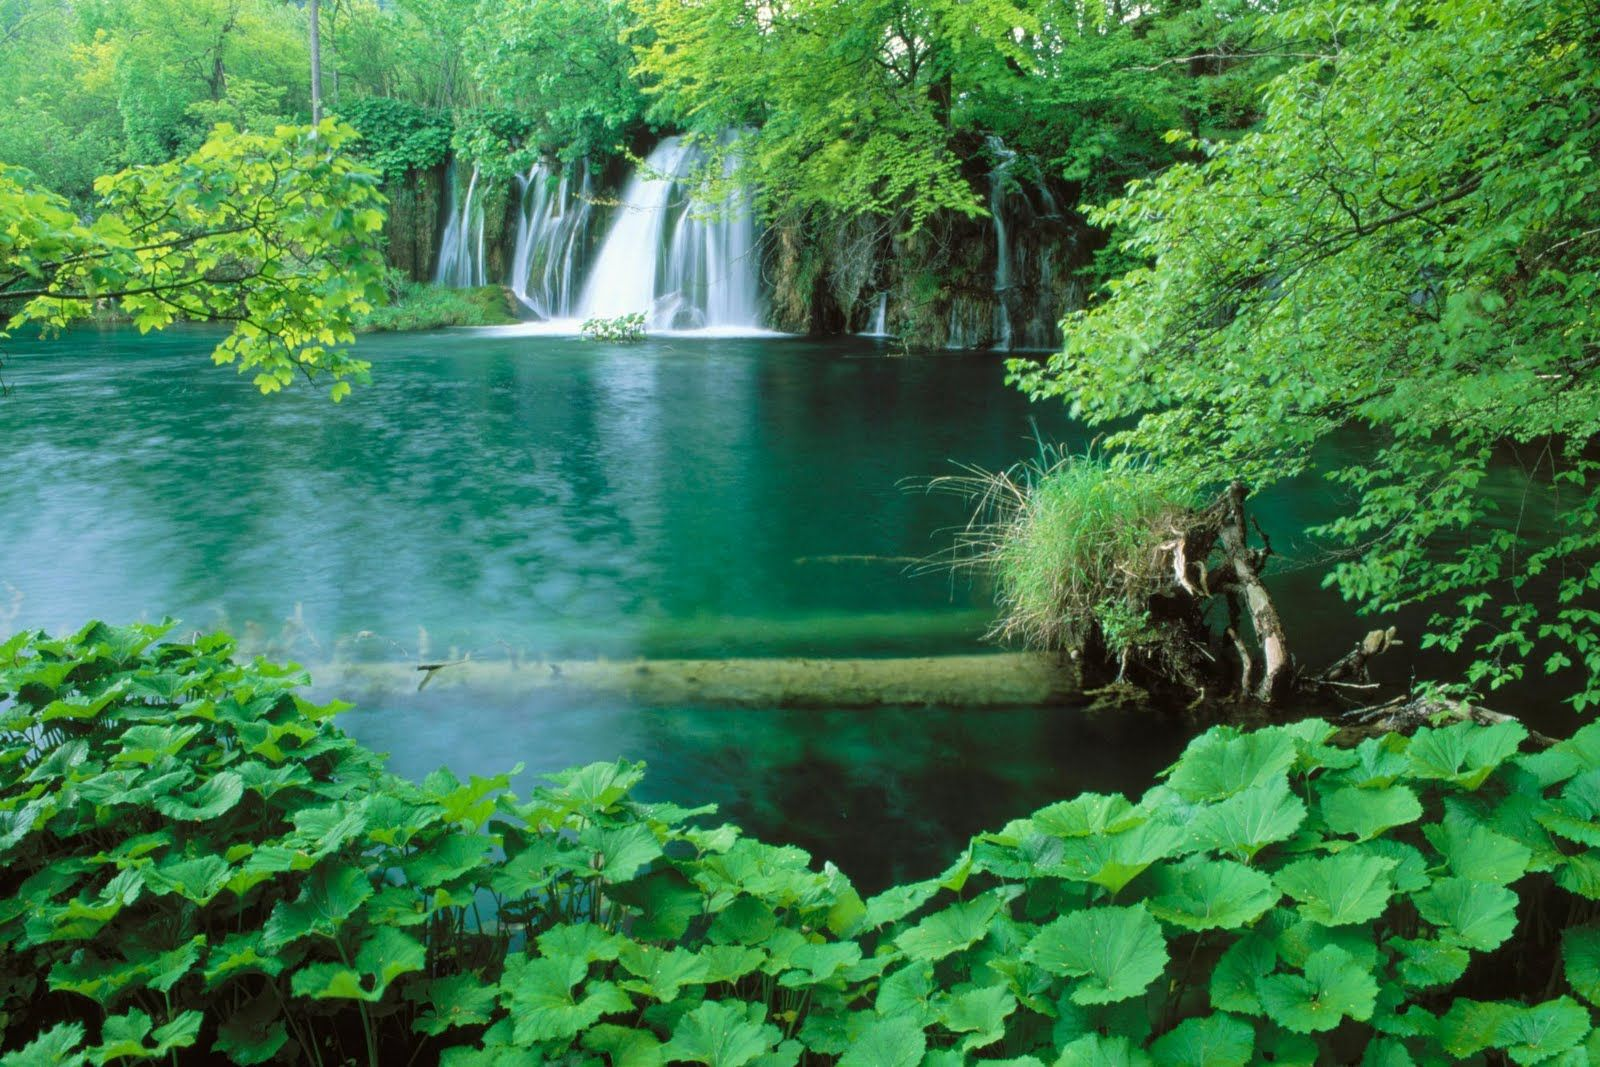 Supernatural Wallpapers Super Natural Cool Wallpapers Most Beautiful Nature Part 8 Beautiful Nature Scenes Beautiful Nature Wallpaper Nature Scenes